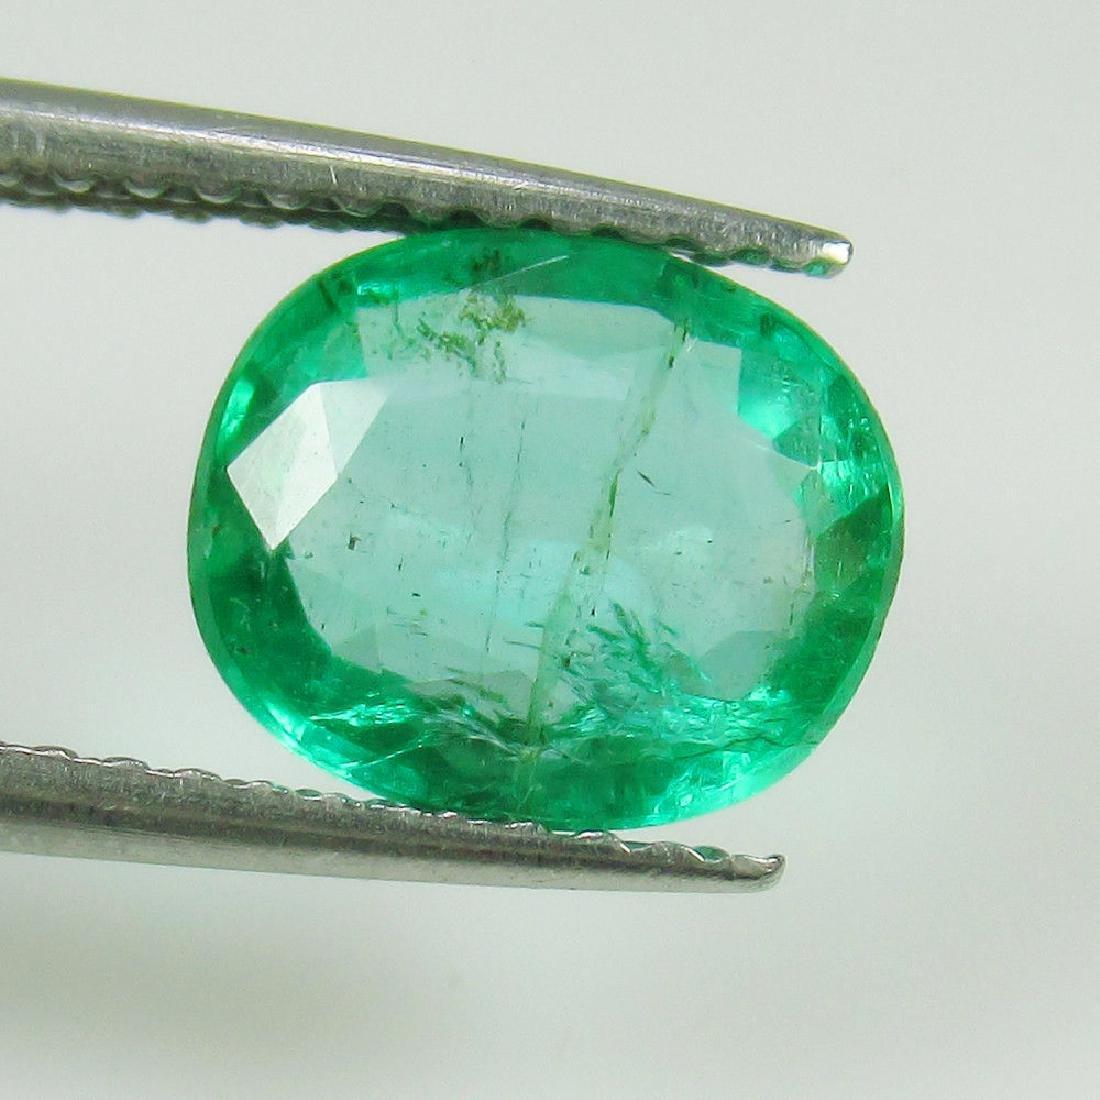 1.57 Ct Genuine Zambian Emerald 8.5x7 mm Oval Cut